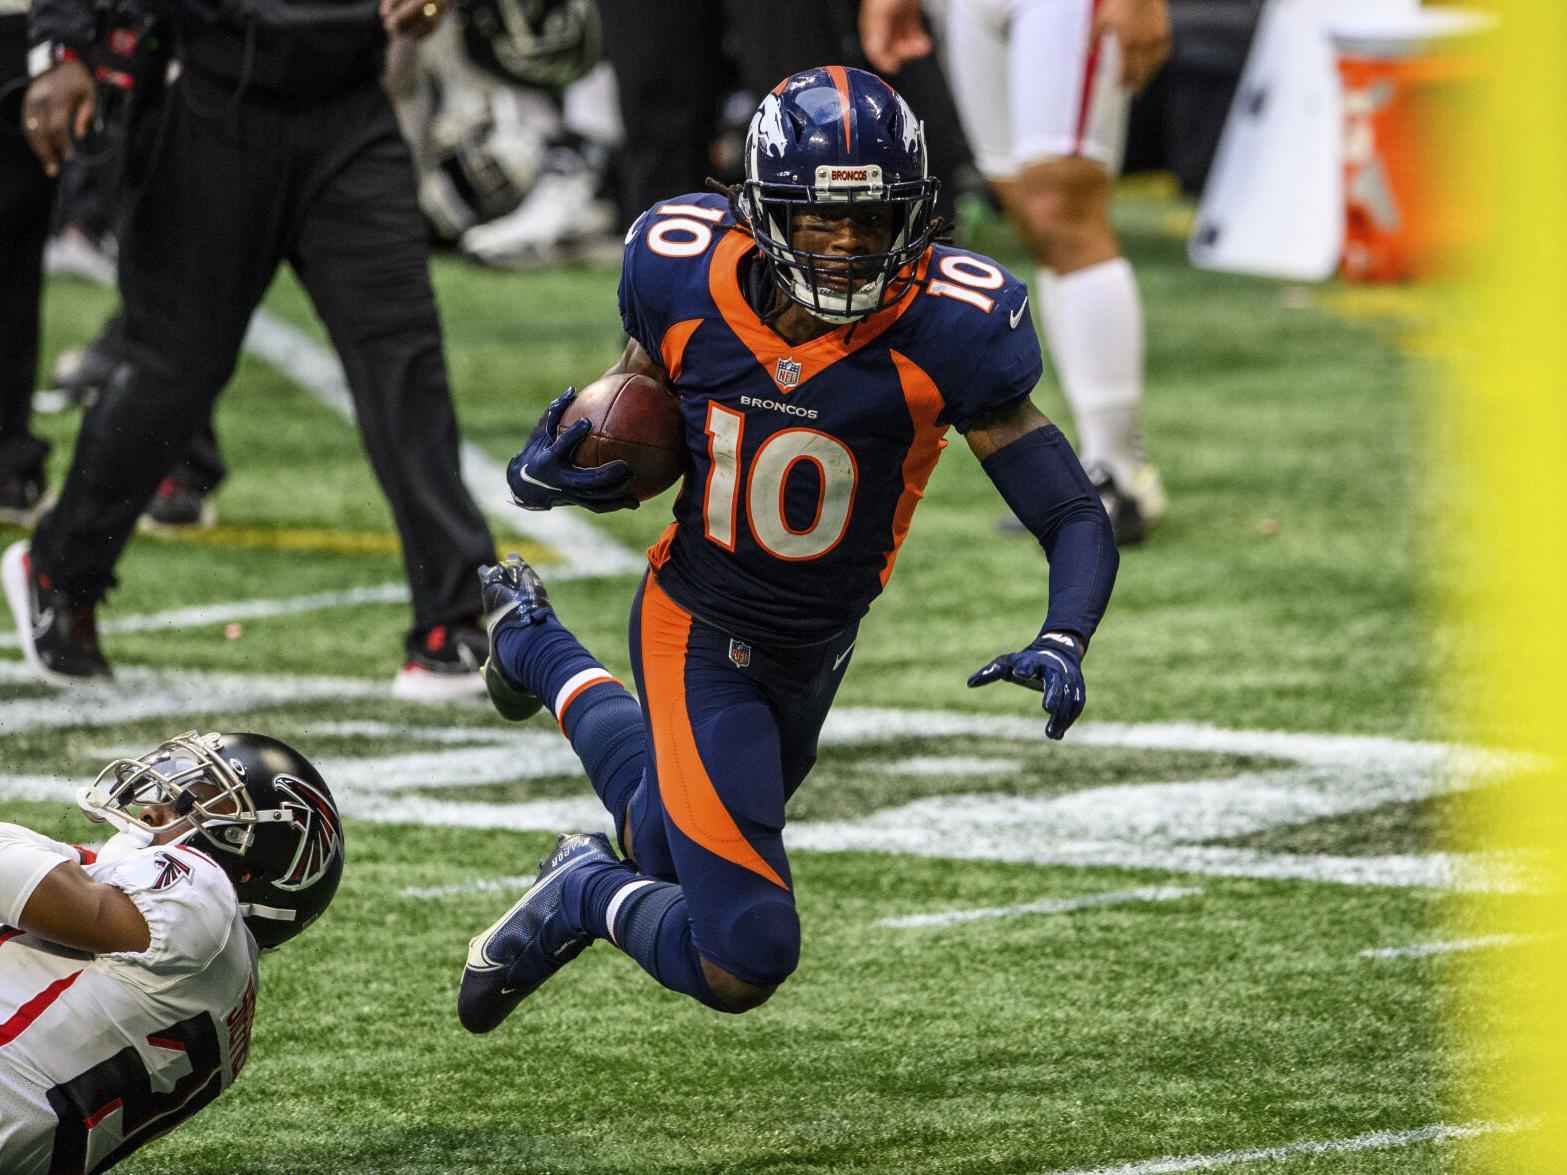 Broncos offense's first-half struggles continue while Jerry Jeudy, K.J.  Hamler show promise | Sports Coverage | gazette.com